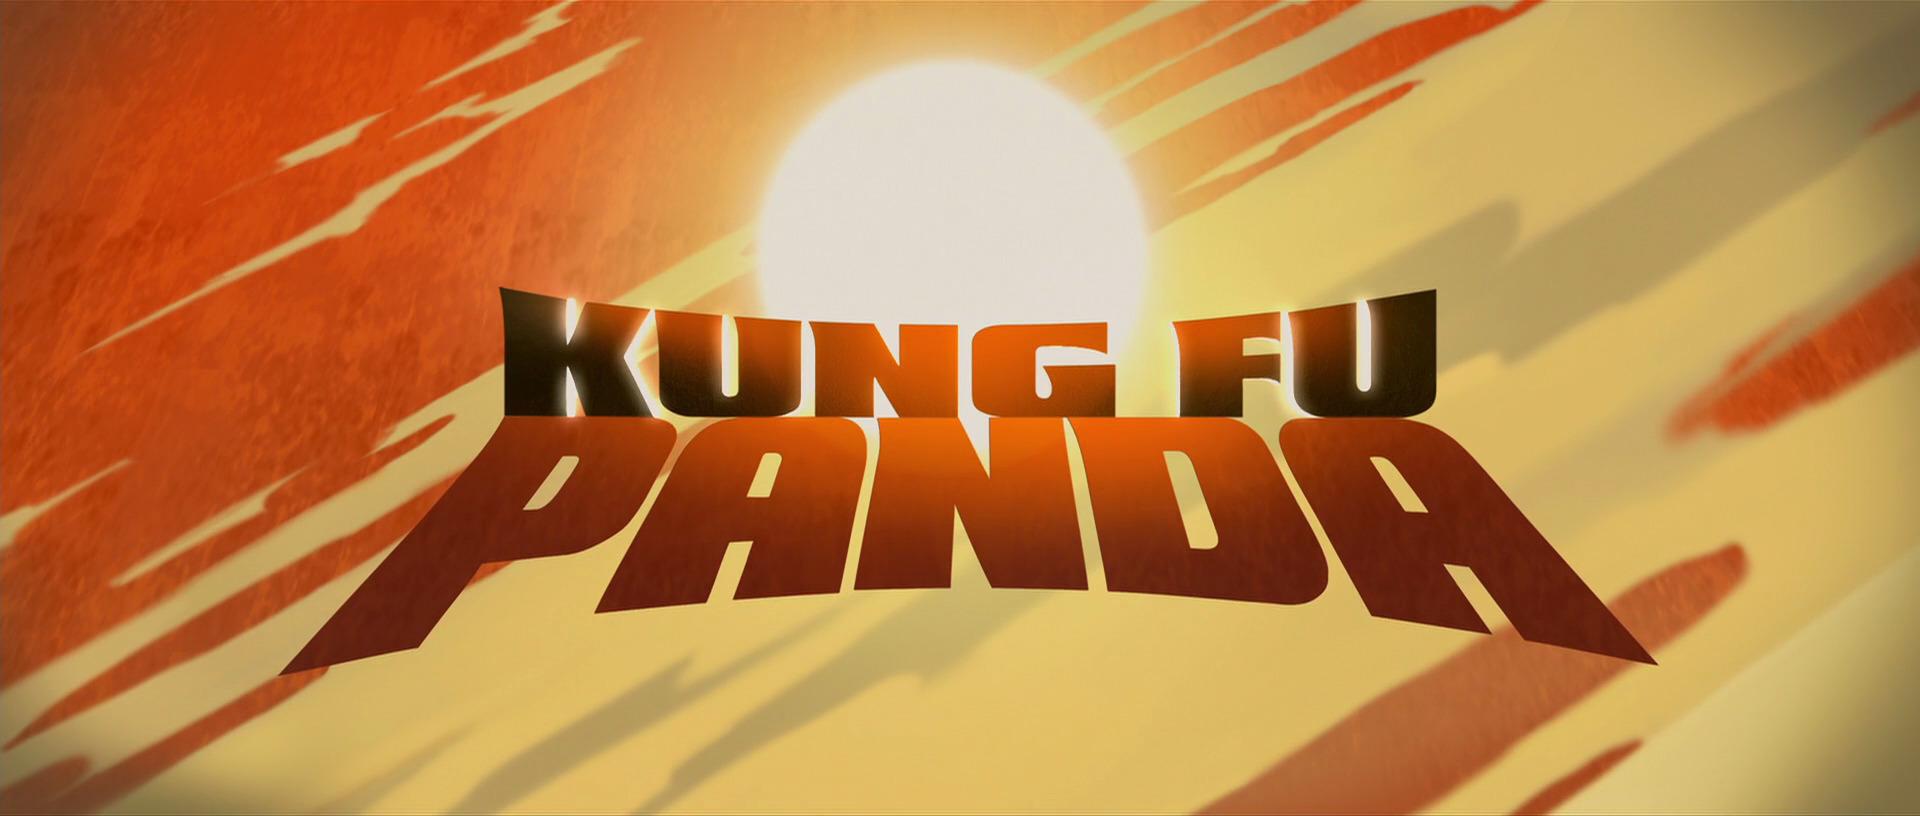 Kung Fu Pandatranscript Kung Fu Panda Wiki Fandom Powered By Wikia